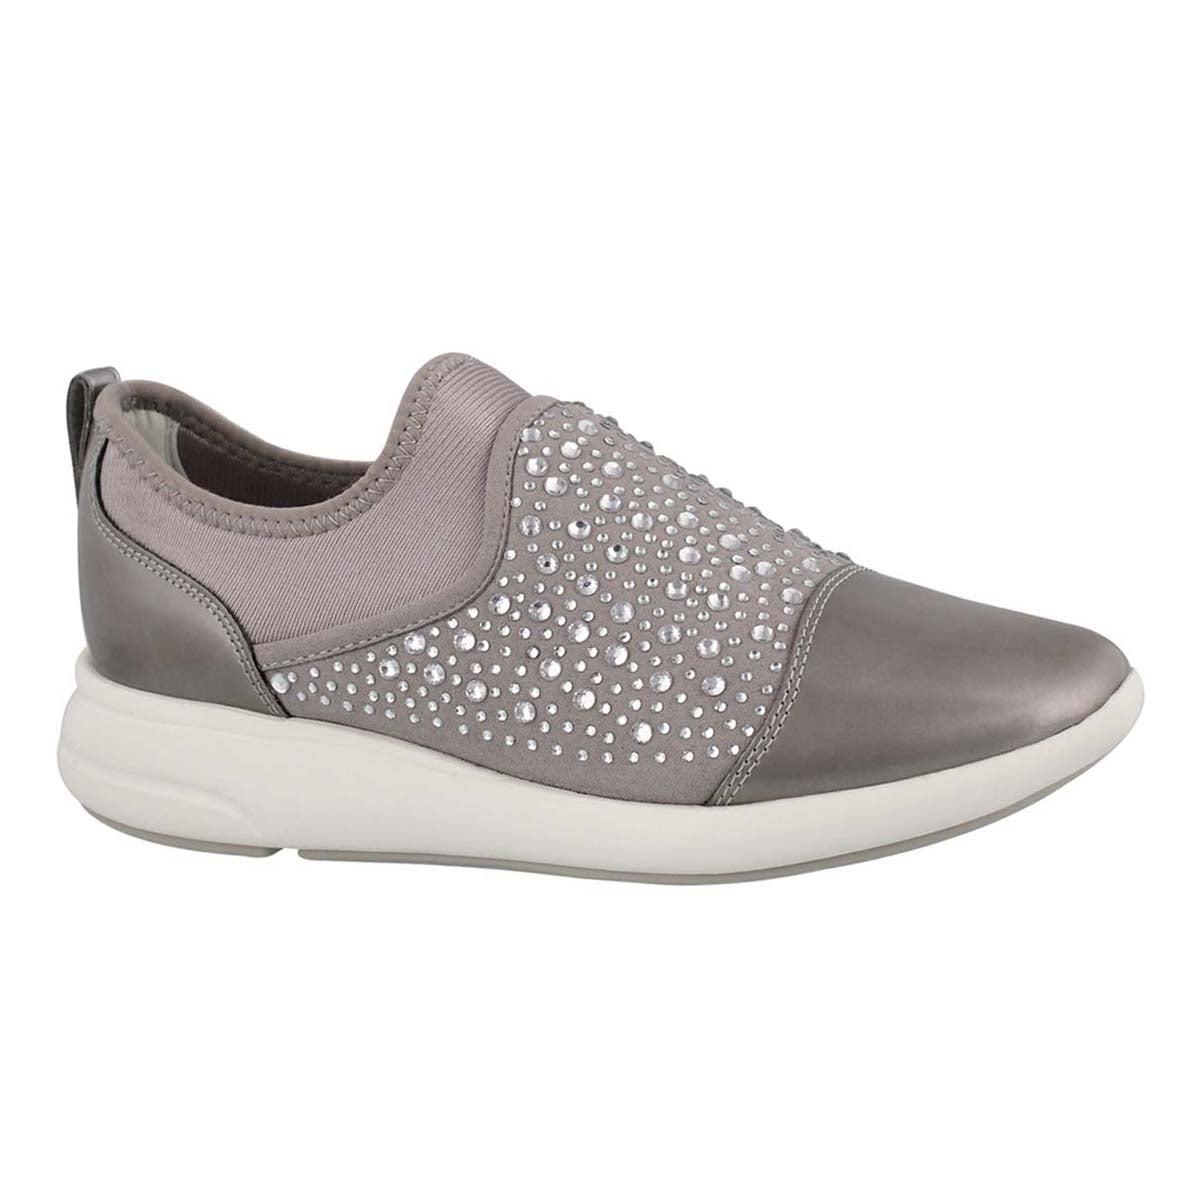 Women's OPHIRA light grey slip on sneakers